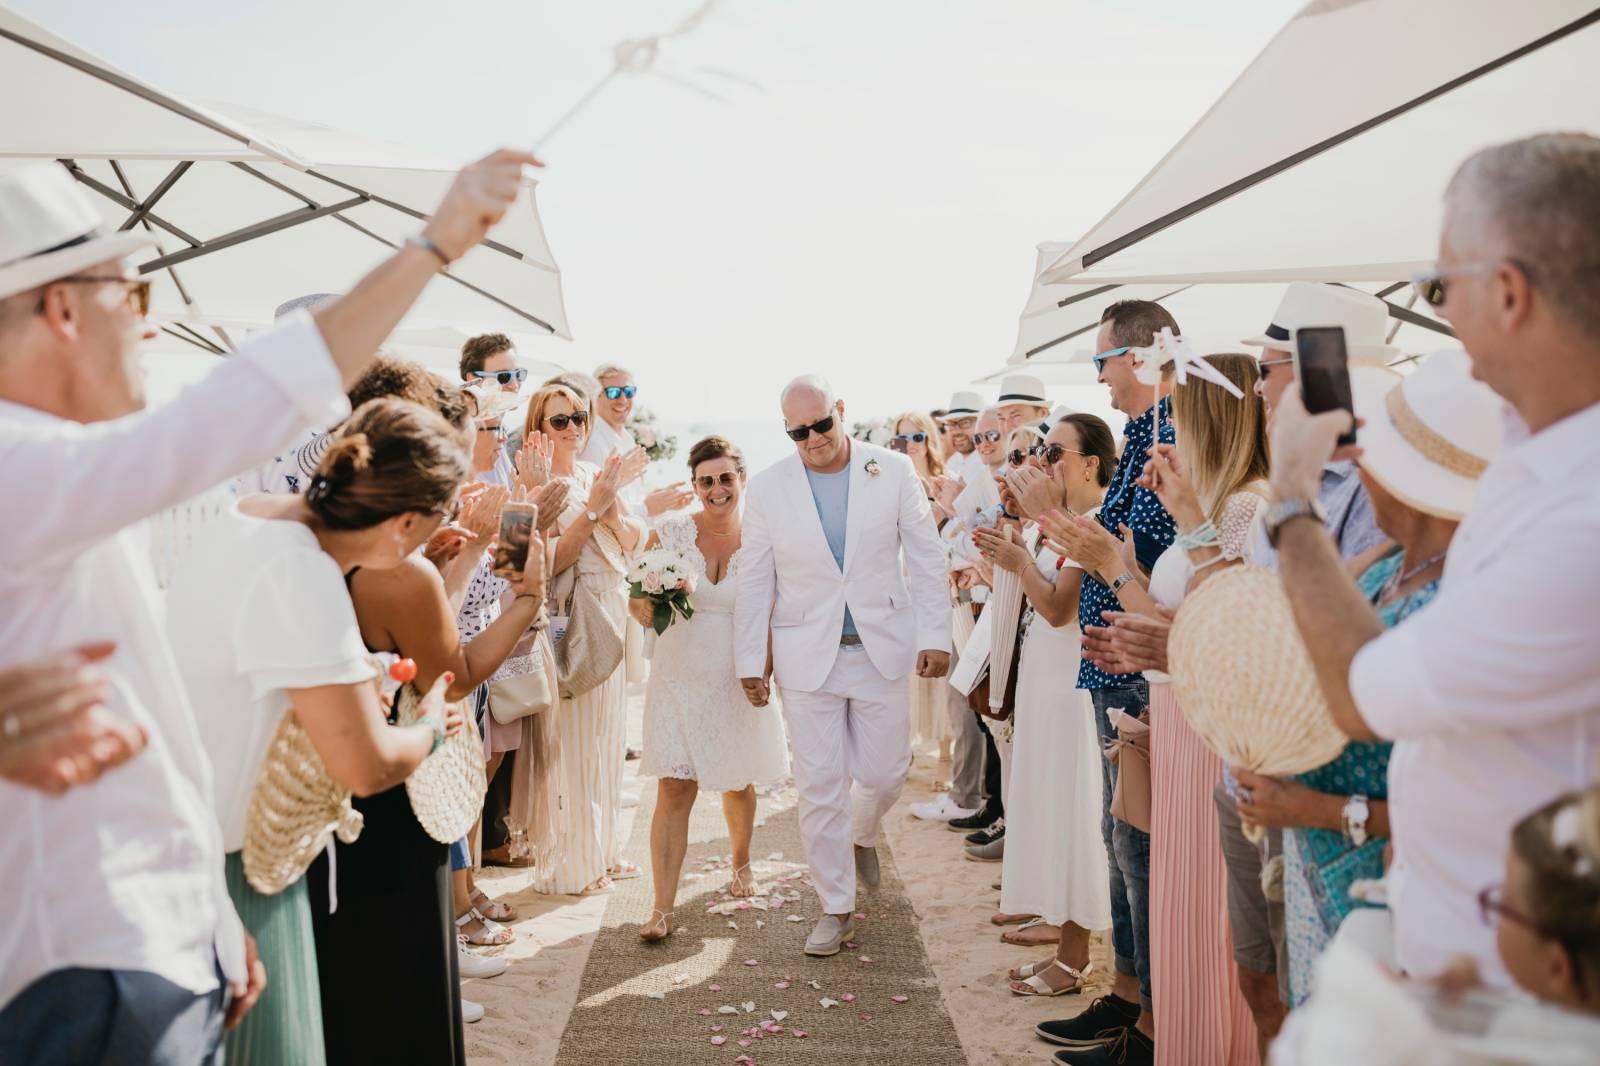 Imperish Weddings & Photography - Trouwfotograaf - Huwelijksfotograaf - Bruidsfotograaf - House of Weddings - 24